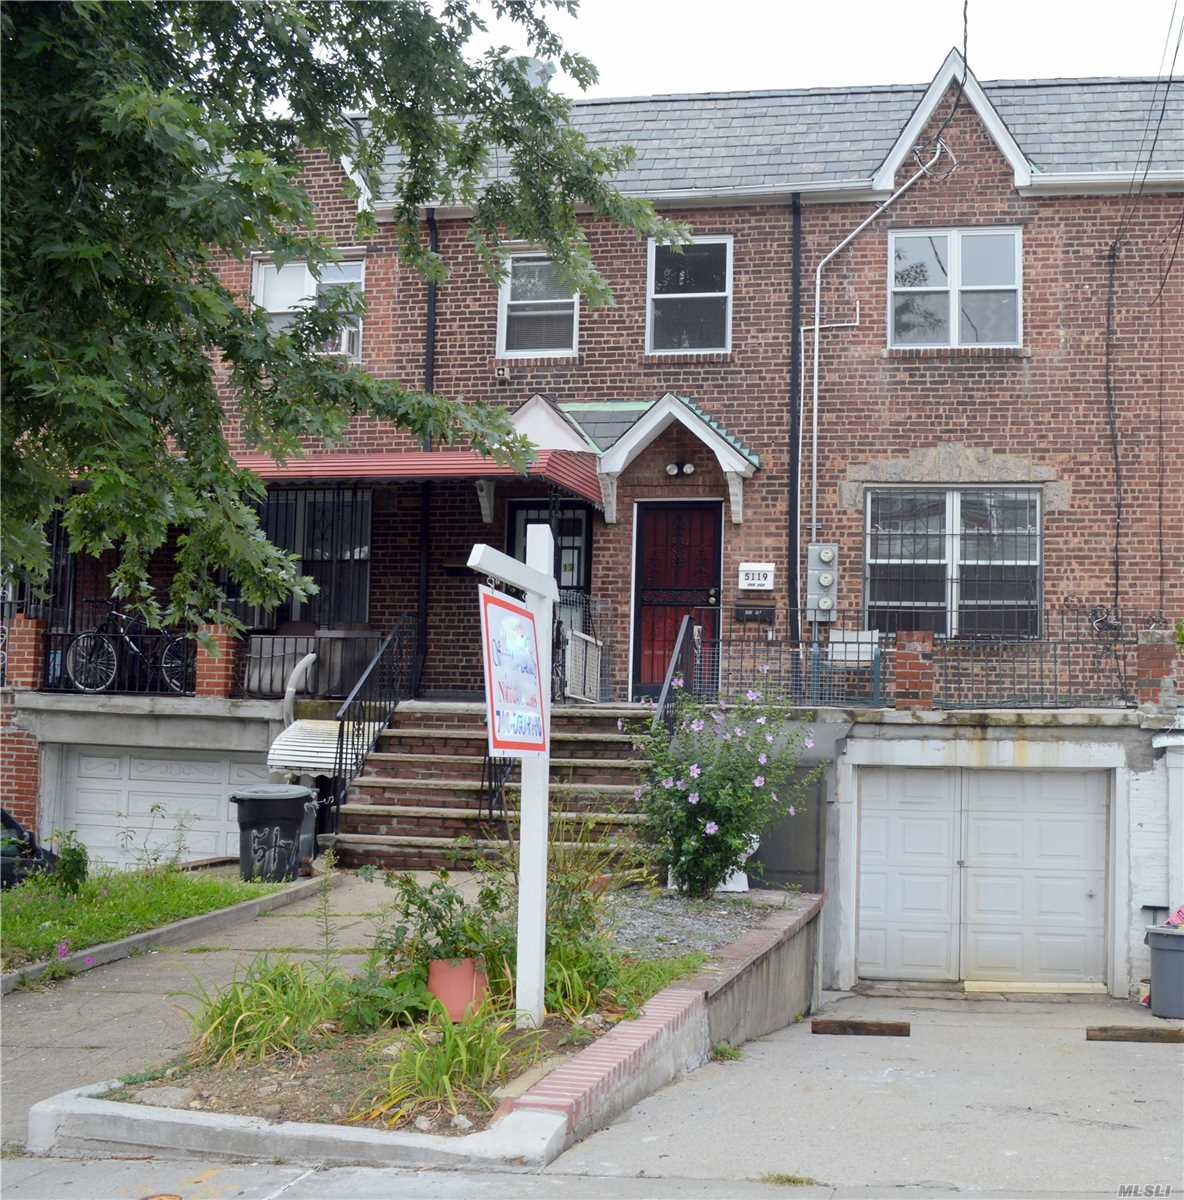 Property for sale at 51-19 69th Street, Maspeth NY 11377, Maspeth,  New York 11377